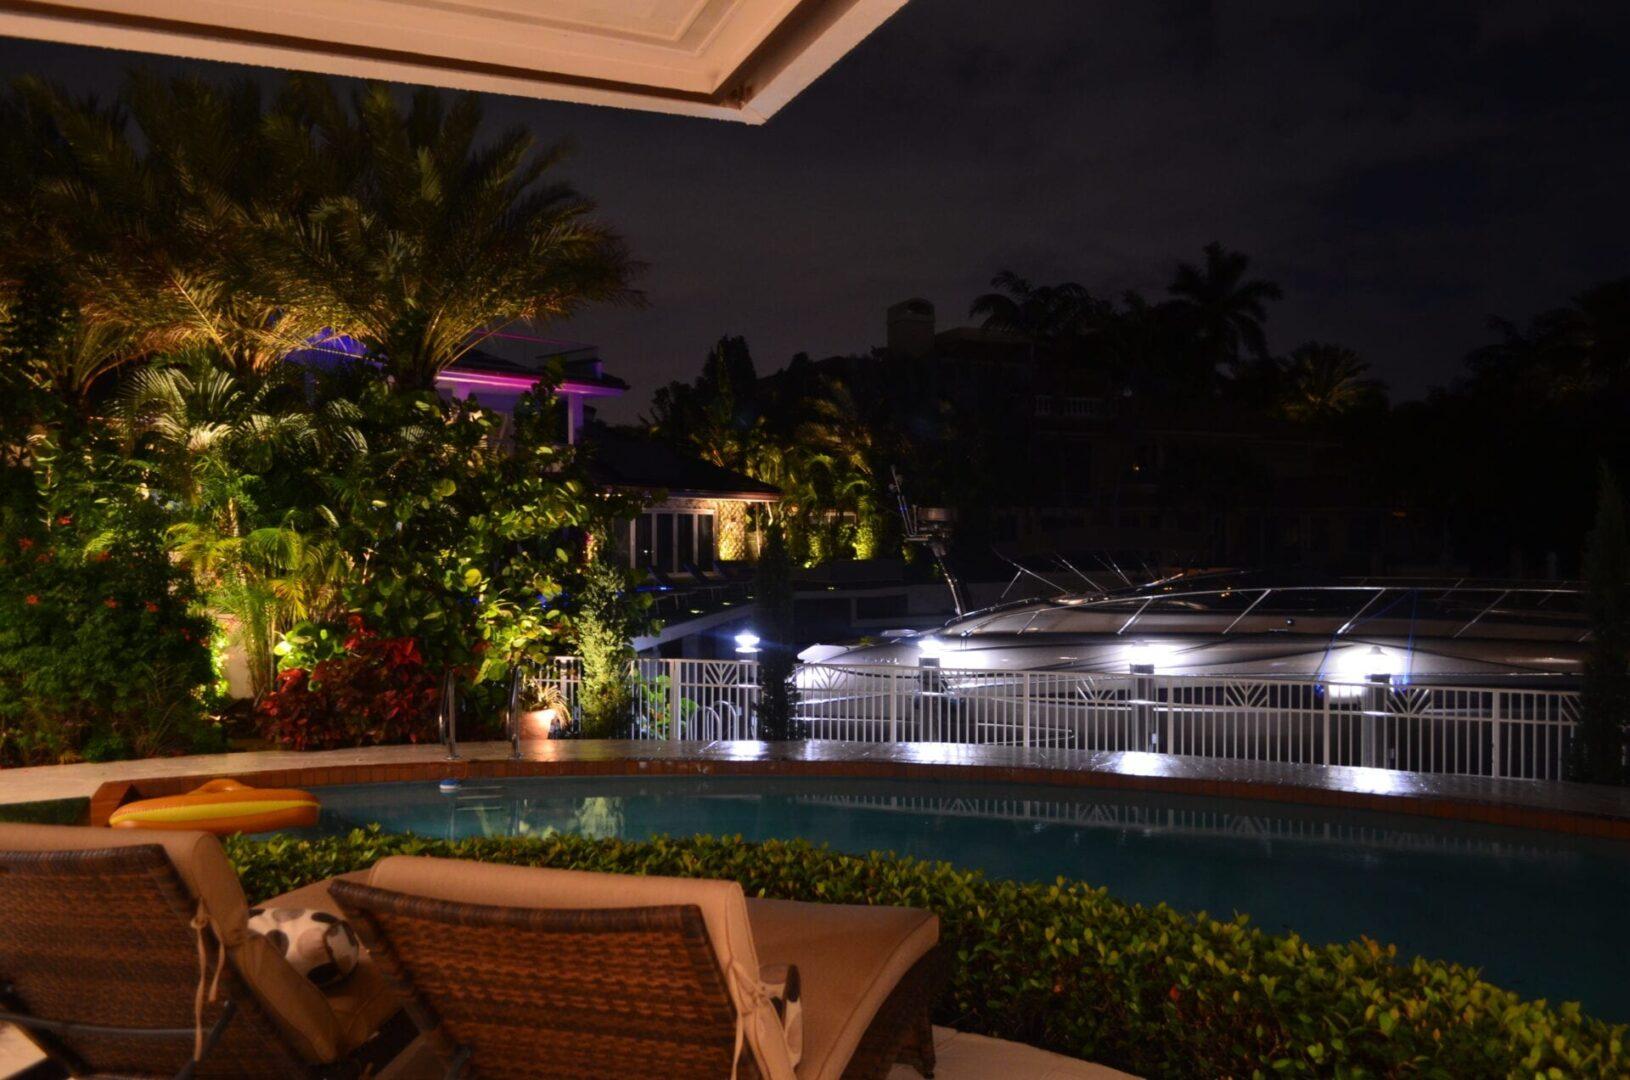 Illumiation FL - Landscape Lighting - Dock Work